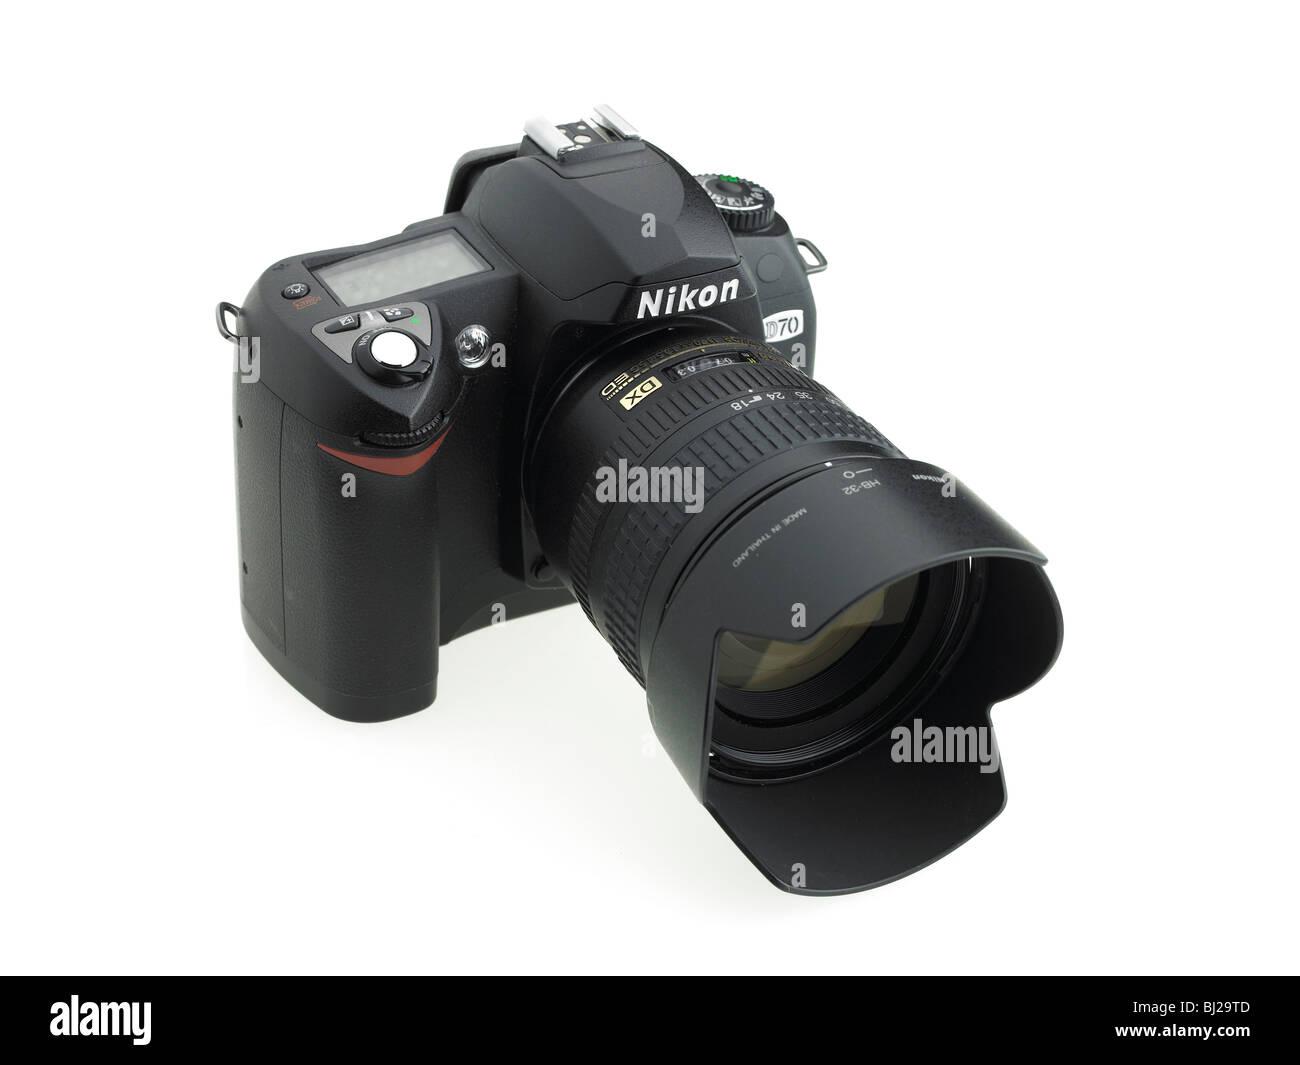 Nikon DSLR camera - Stock Image